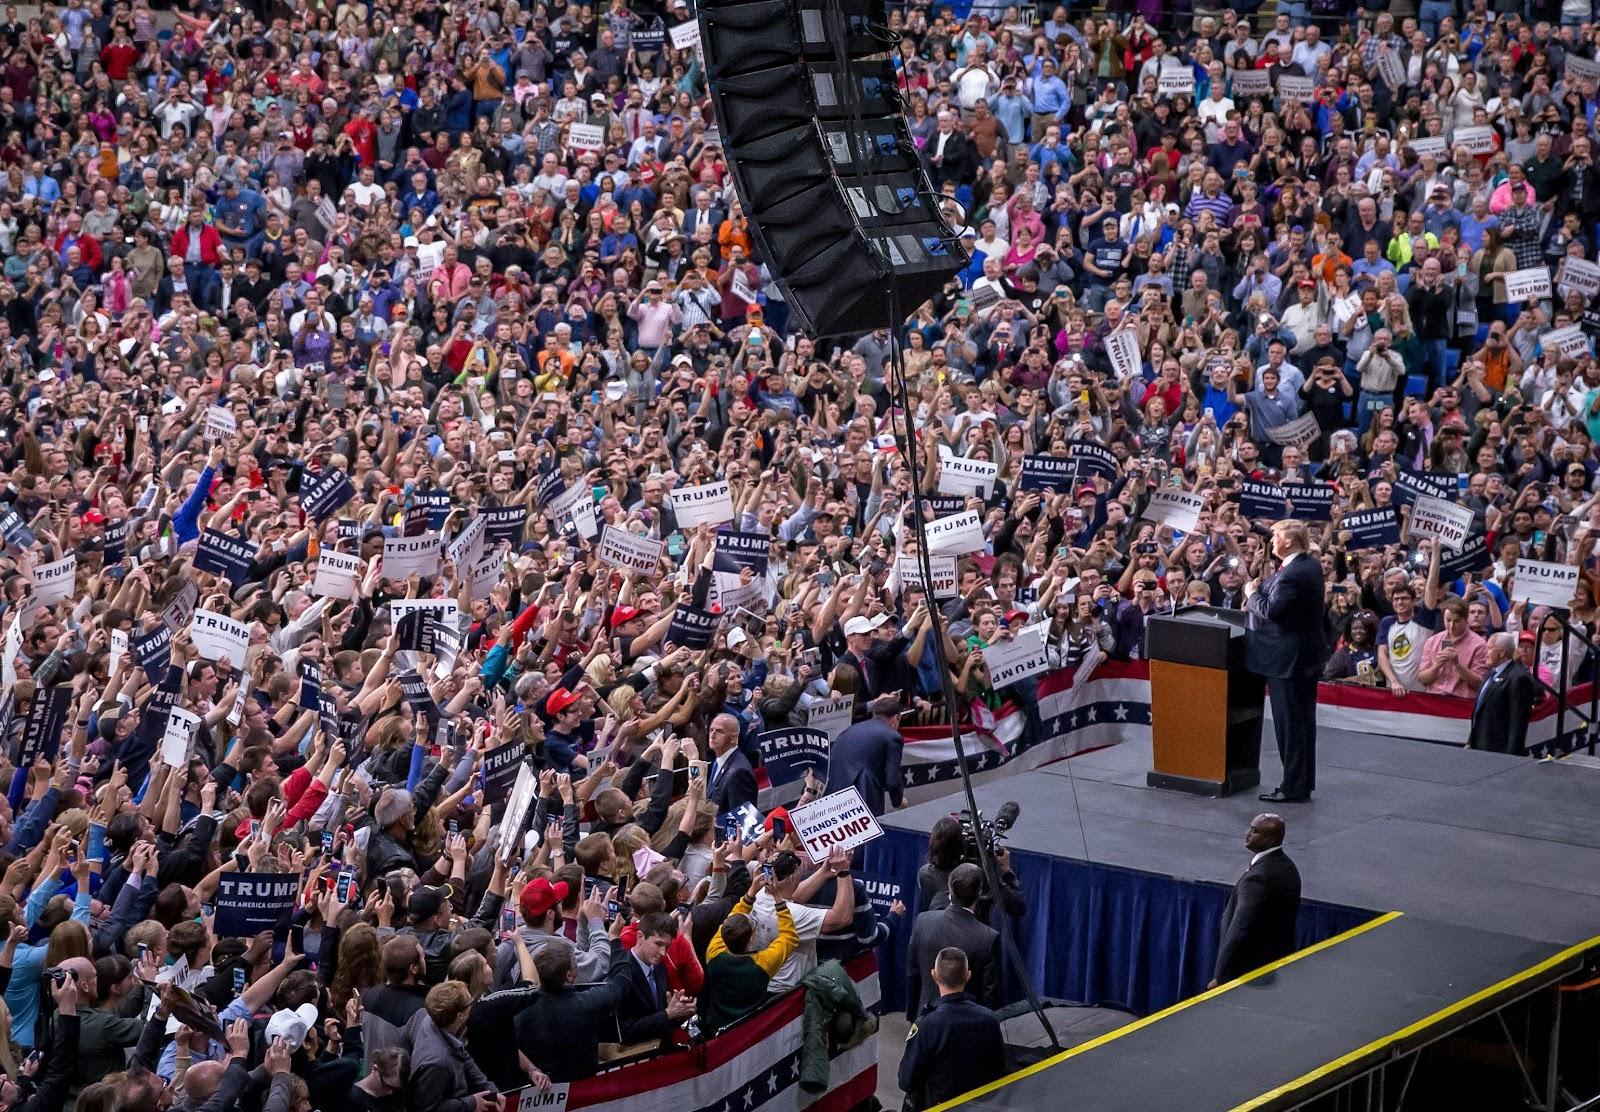 Billedresultat for crowds at trump rallies